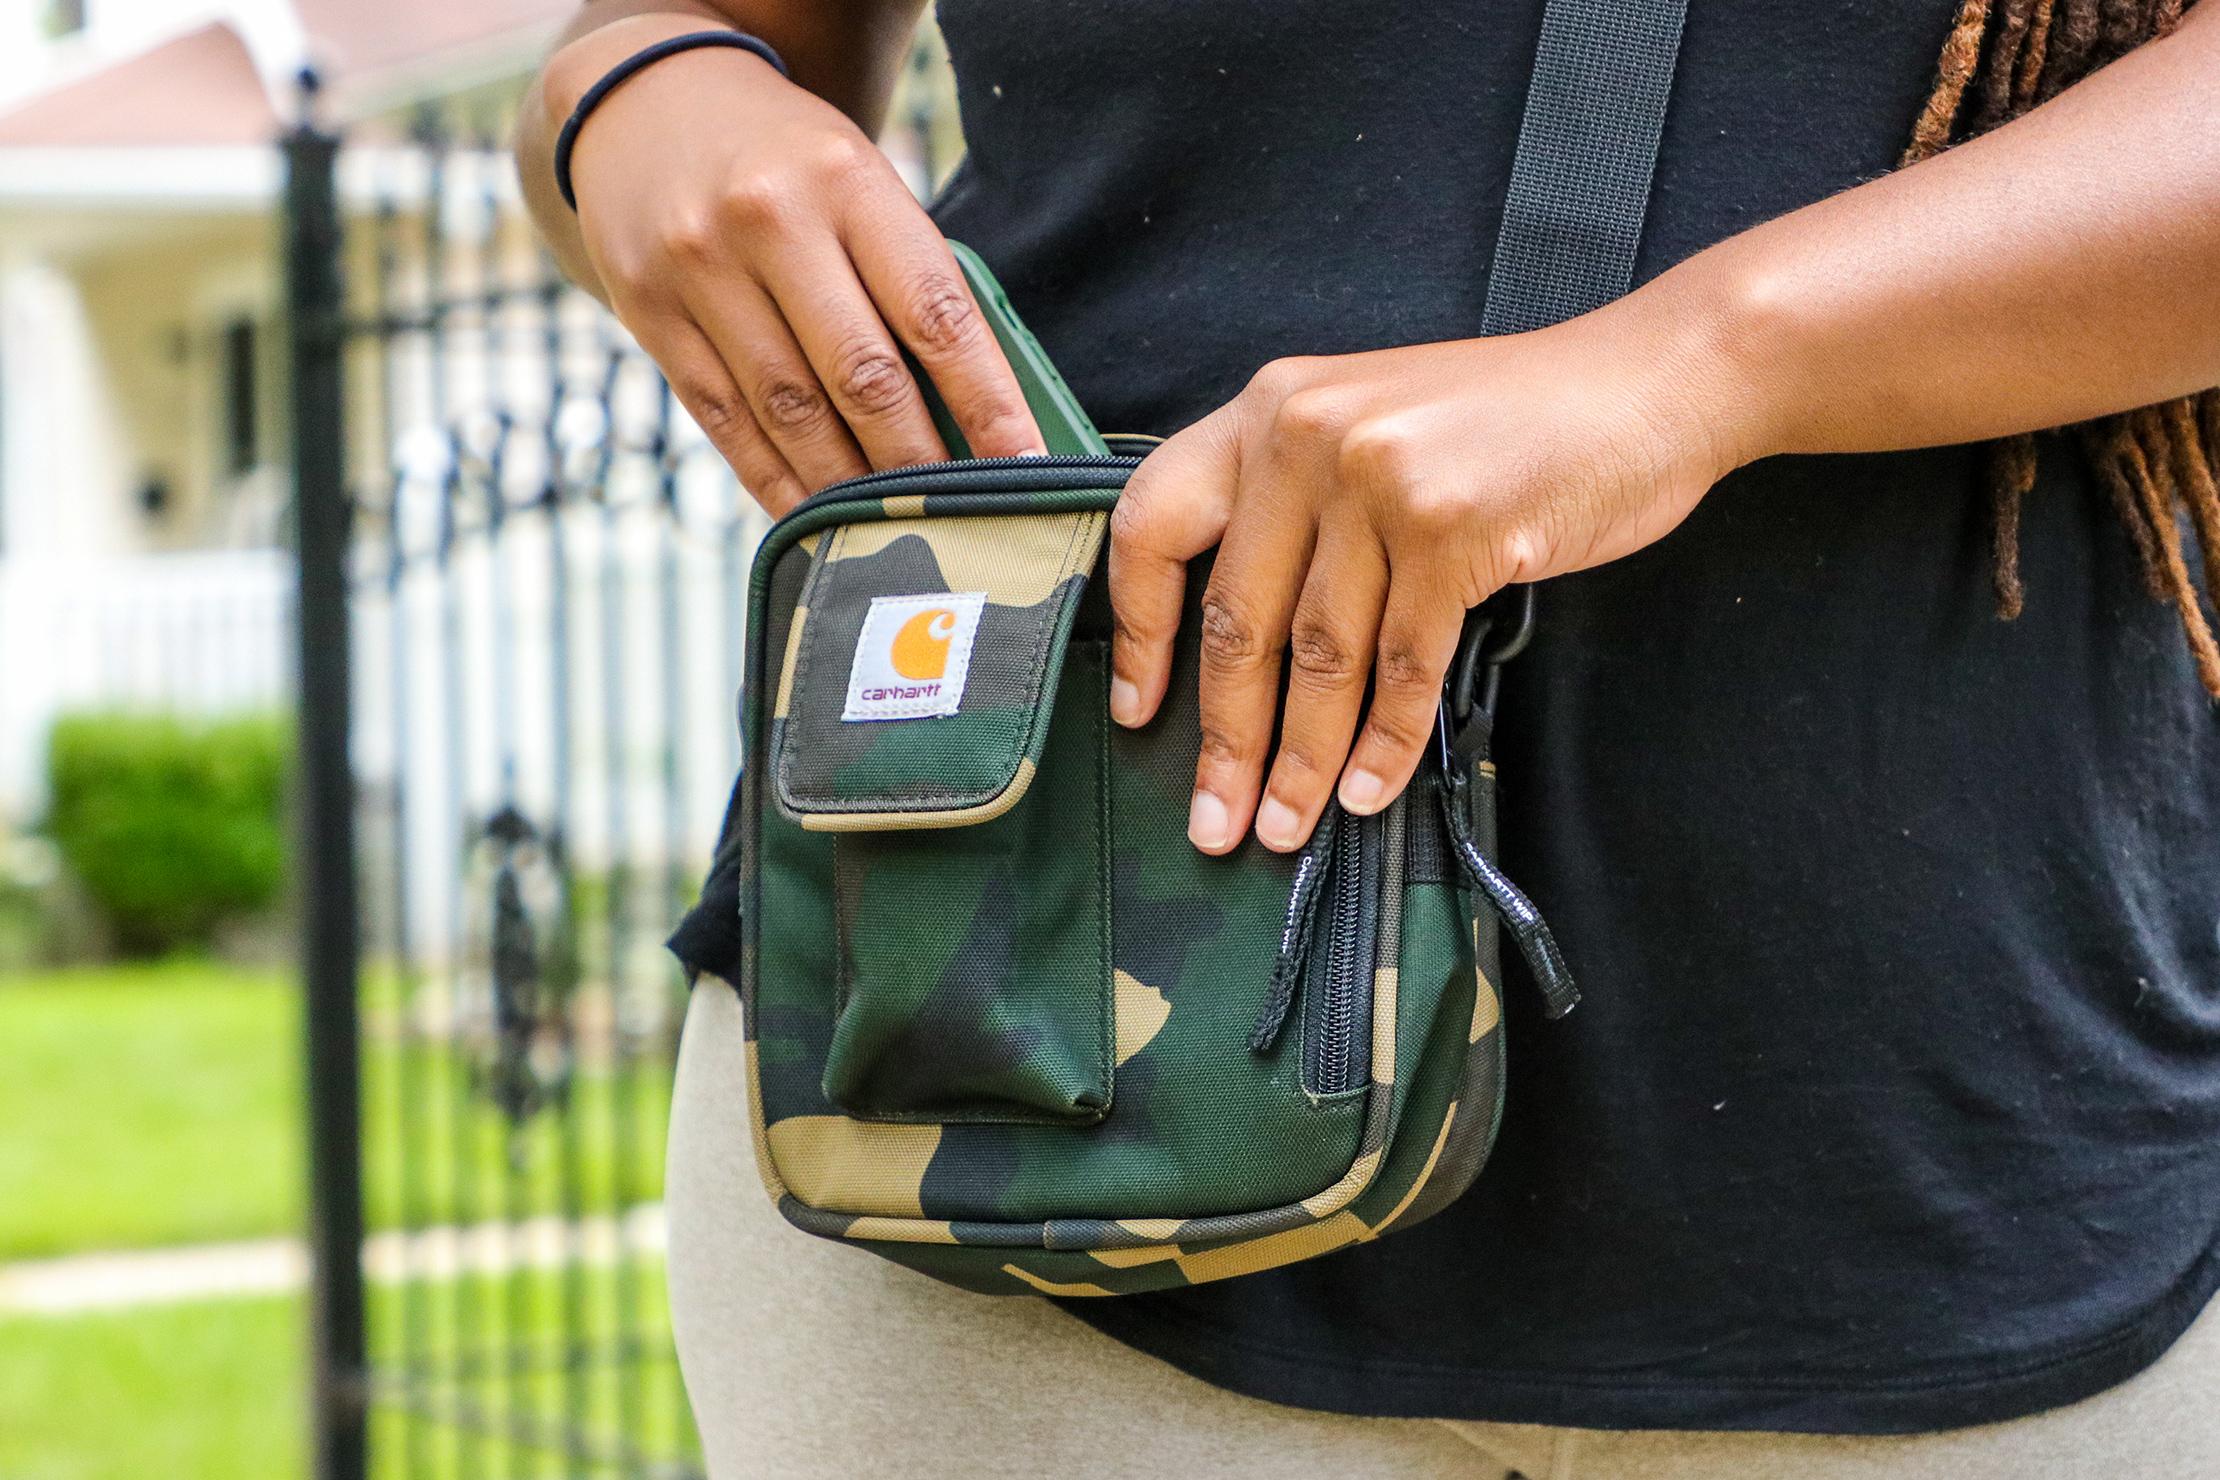 Carhartt WIP Essentials Bag usage